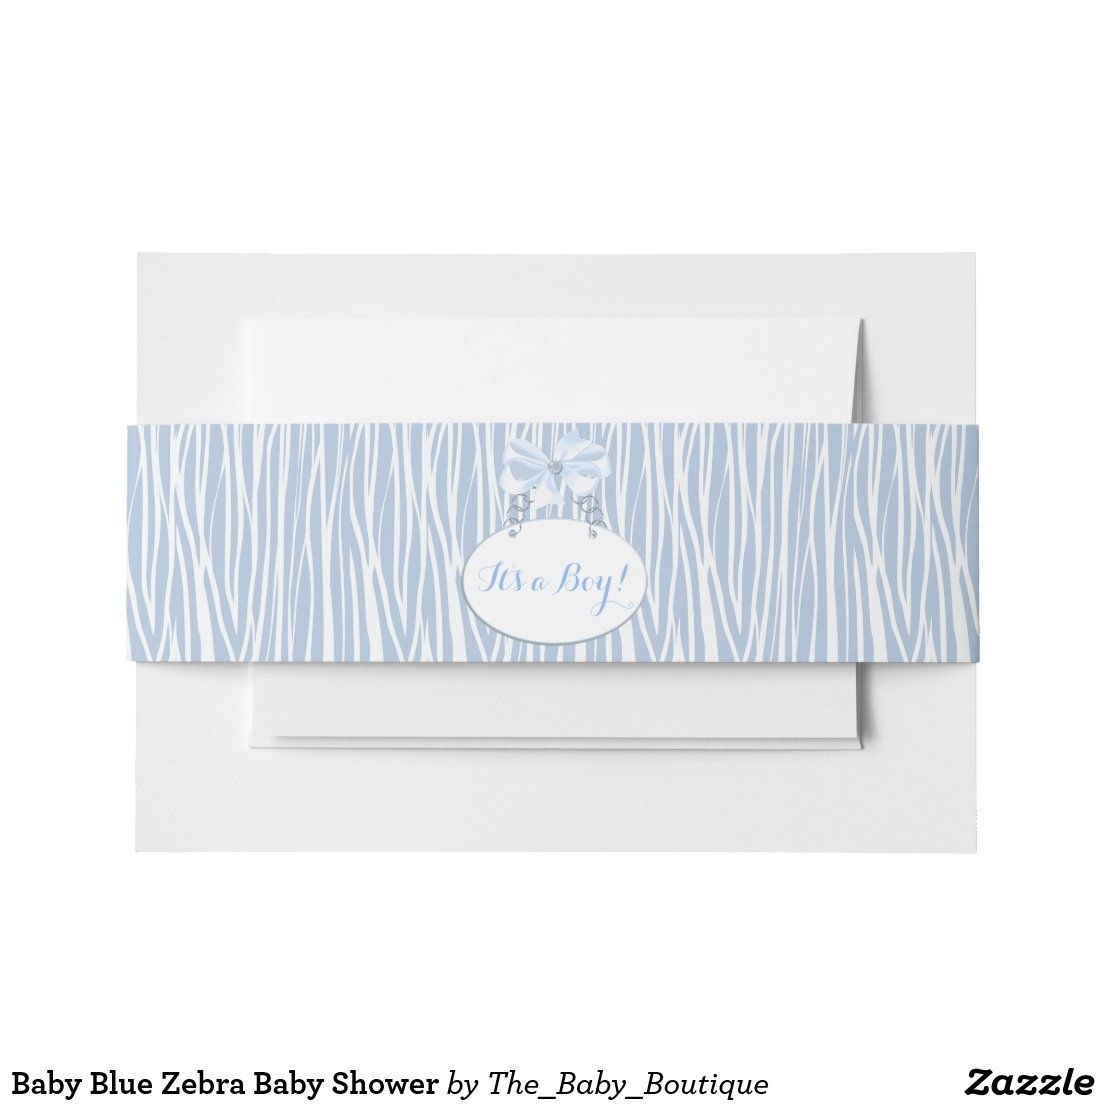 Baby Blue Zebra Baby Shower Invitation Belly Band | Zazzle ...